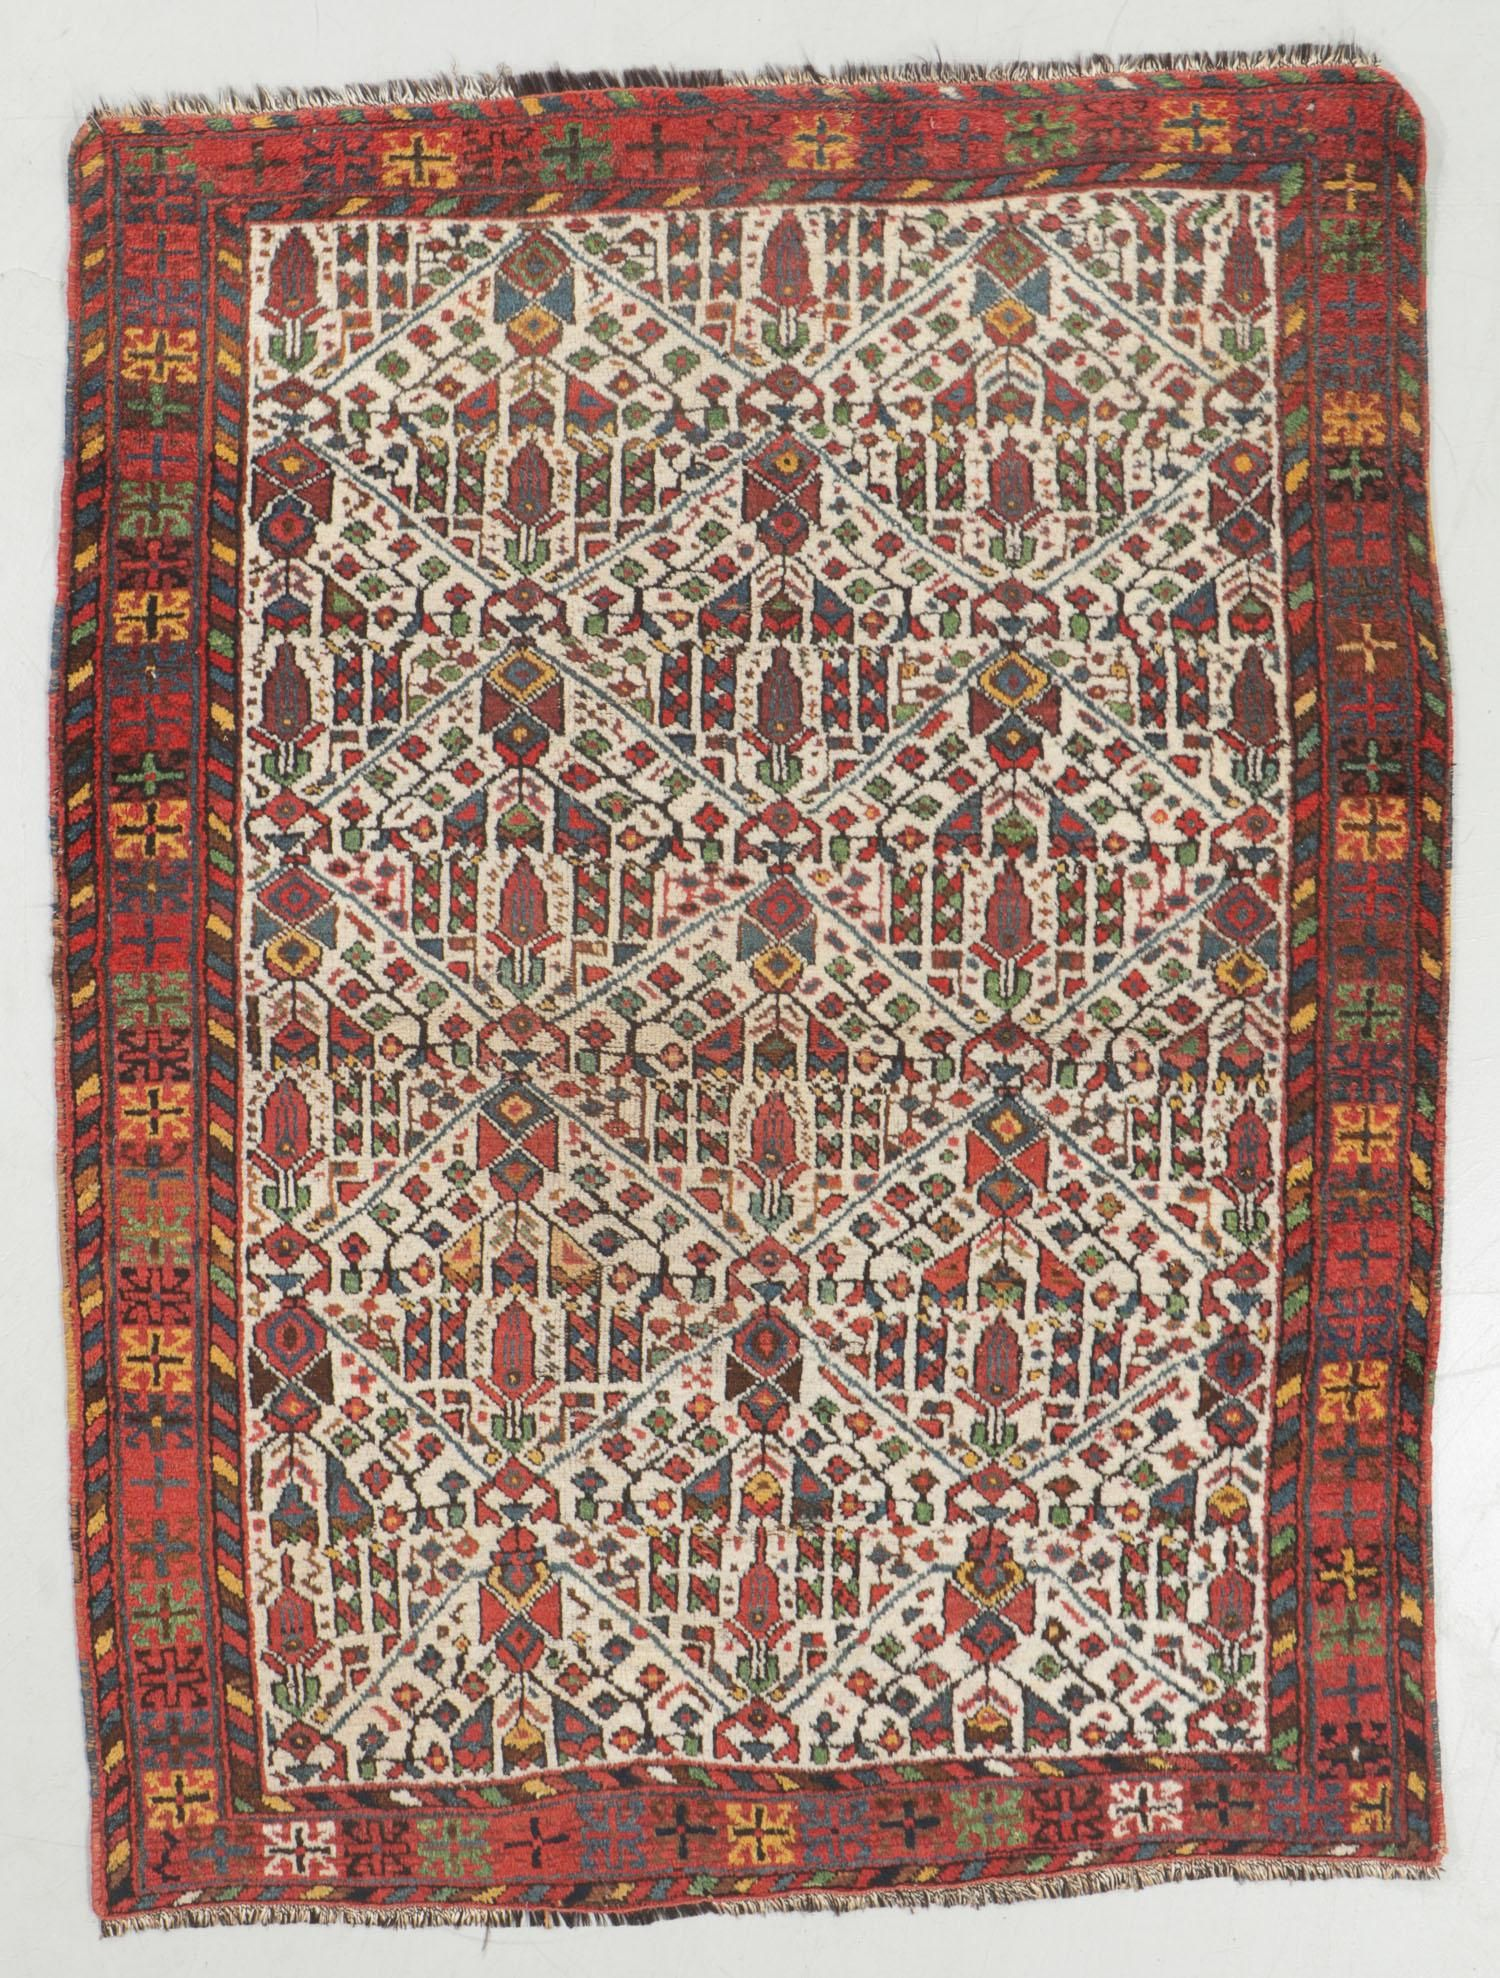 Antique Afshar Rug, Persia: 3'11'' x 5'2''